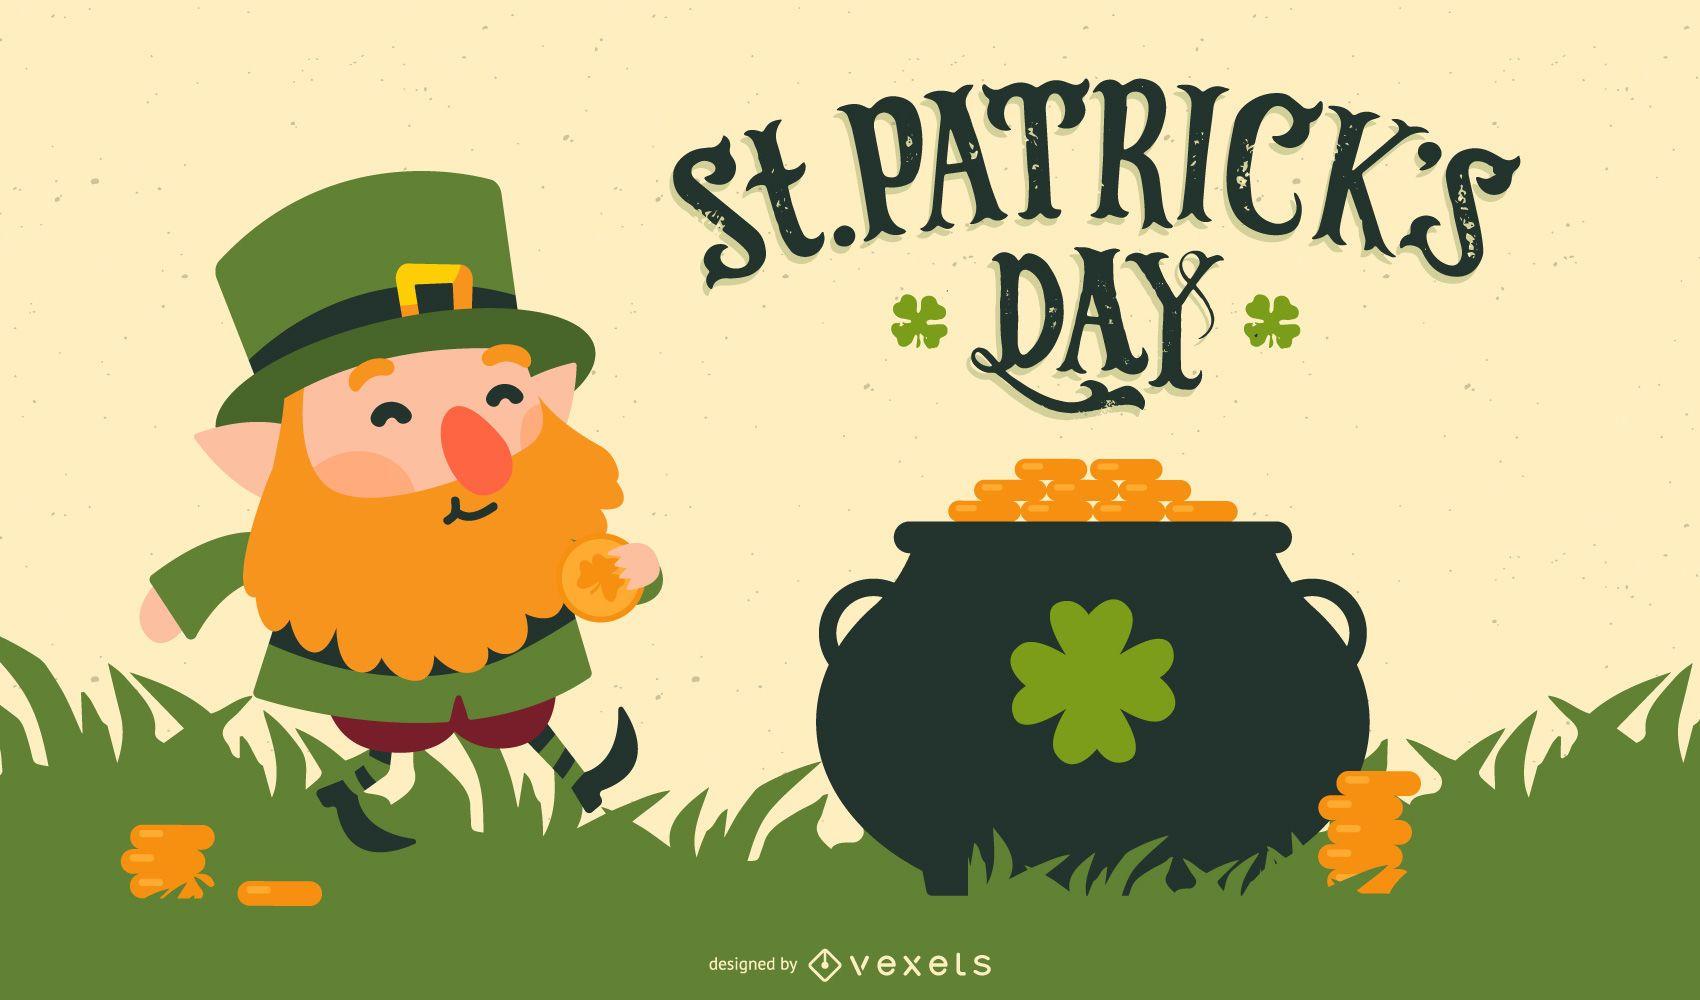 st. patrick's day leprechaun illustration